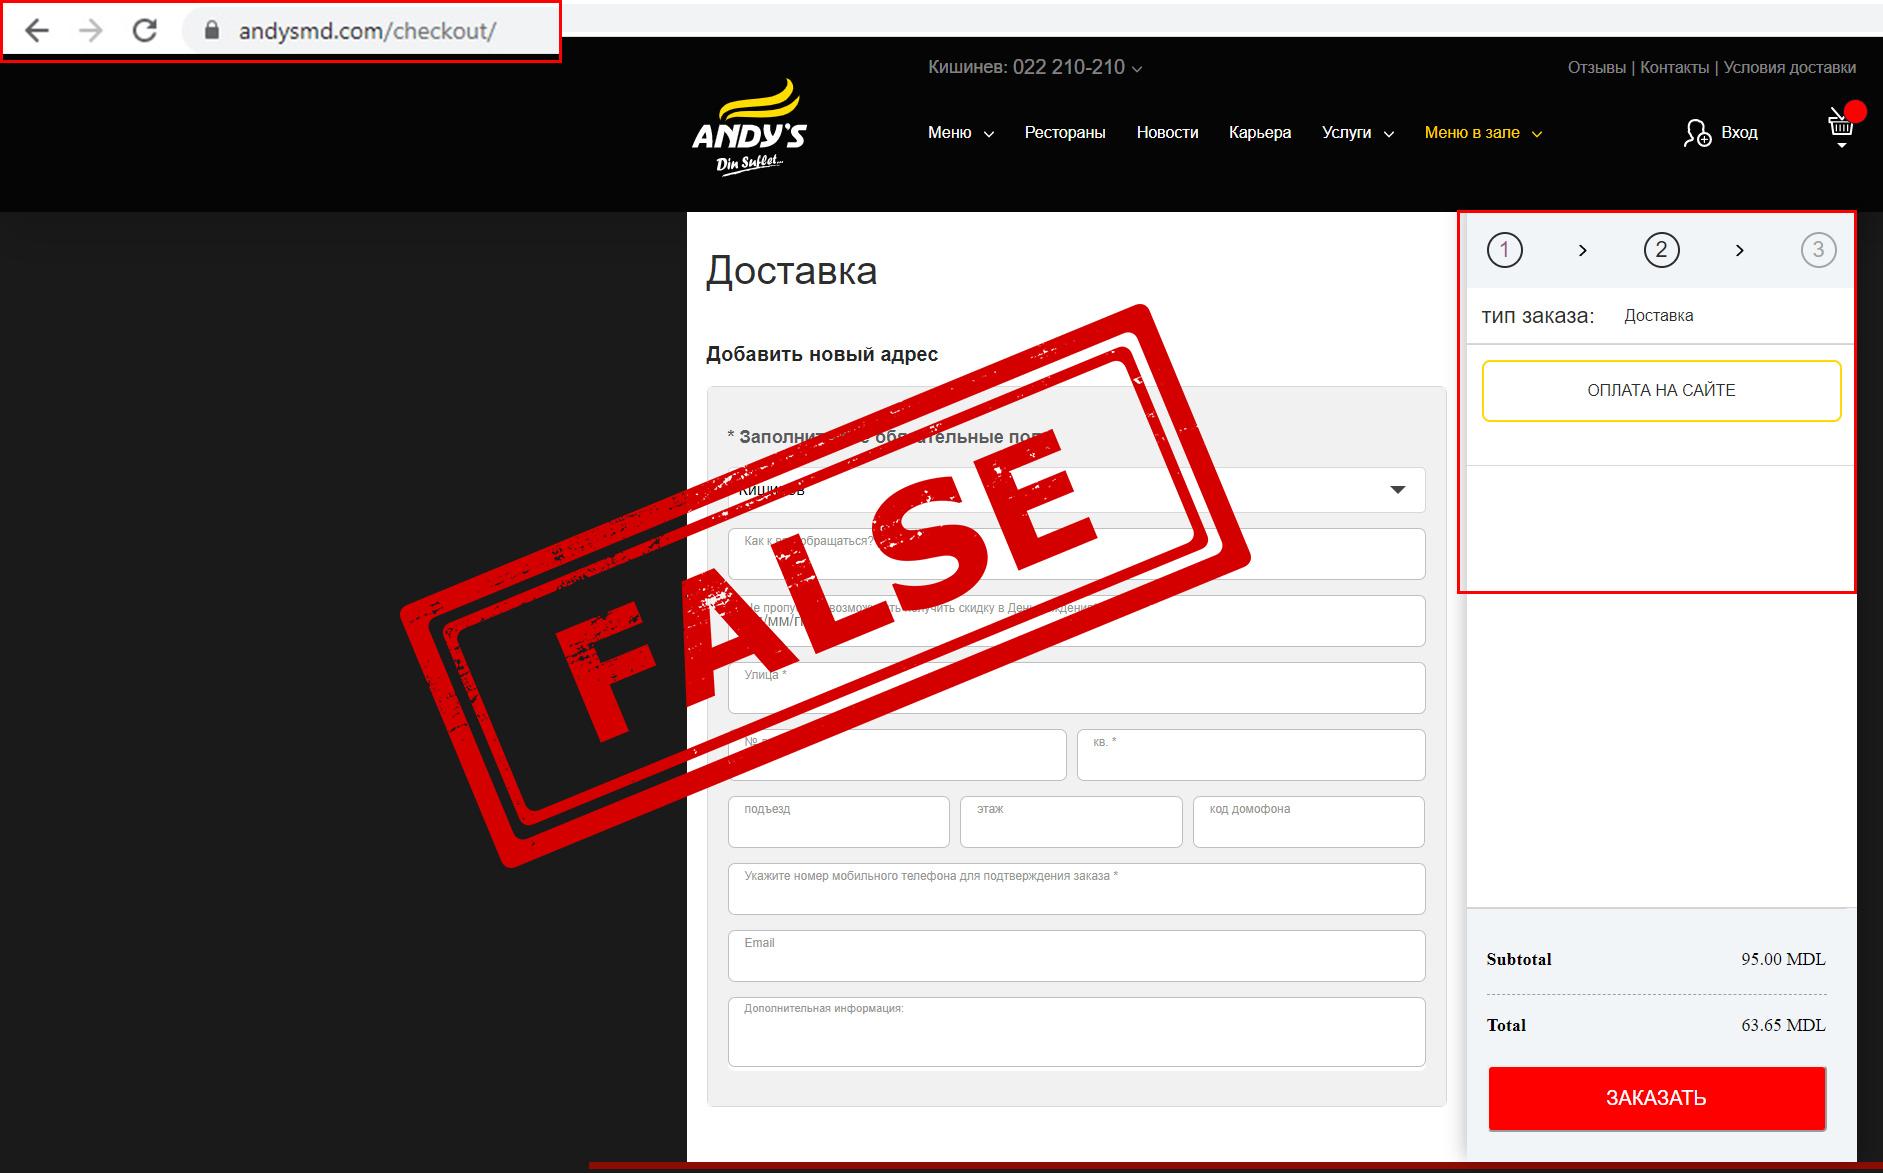 andys pizza site fals